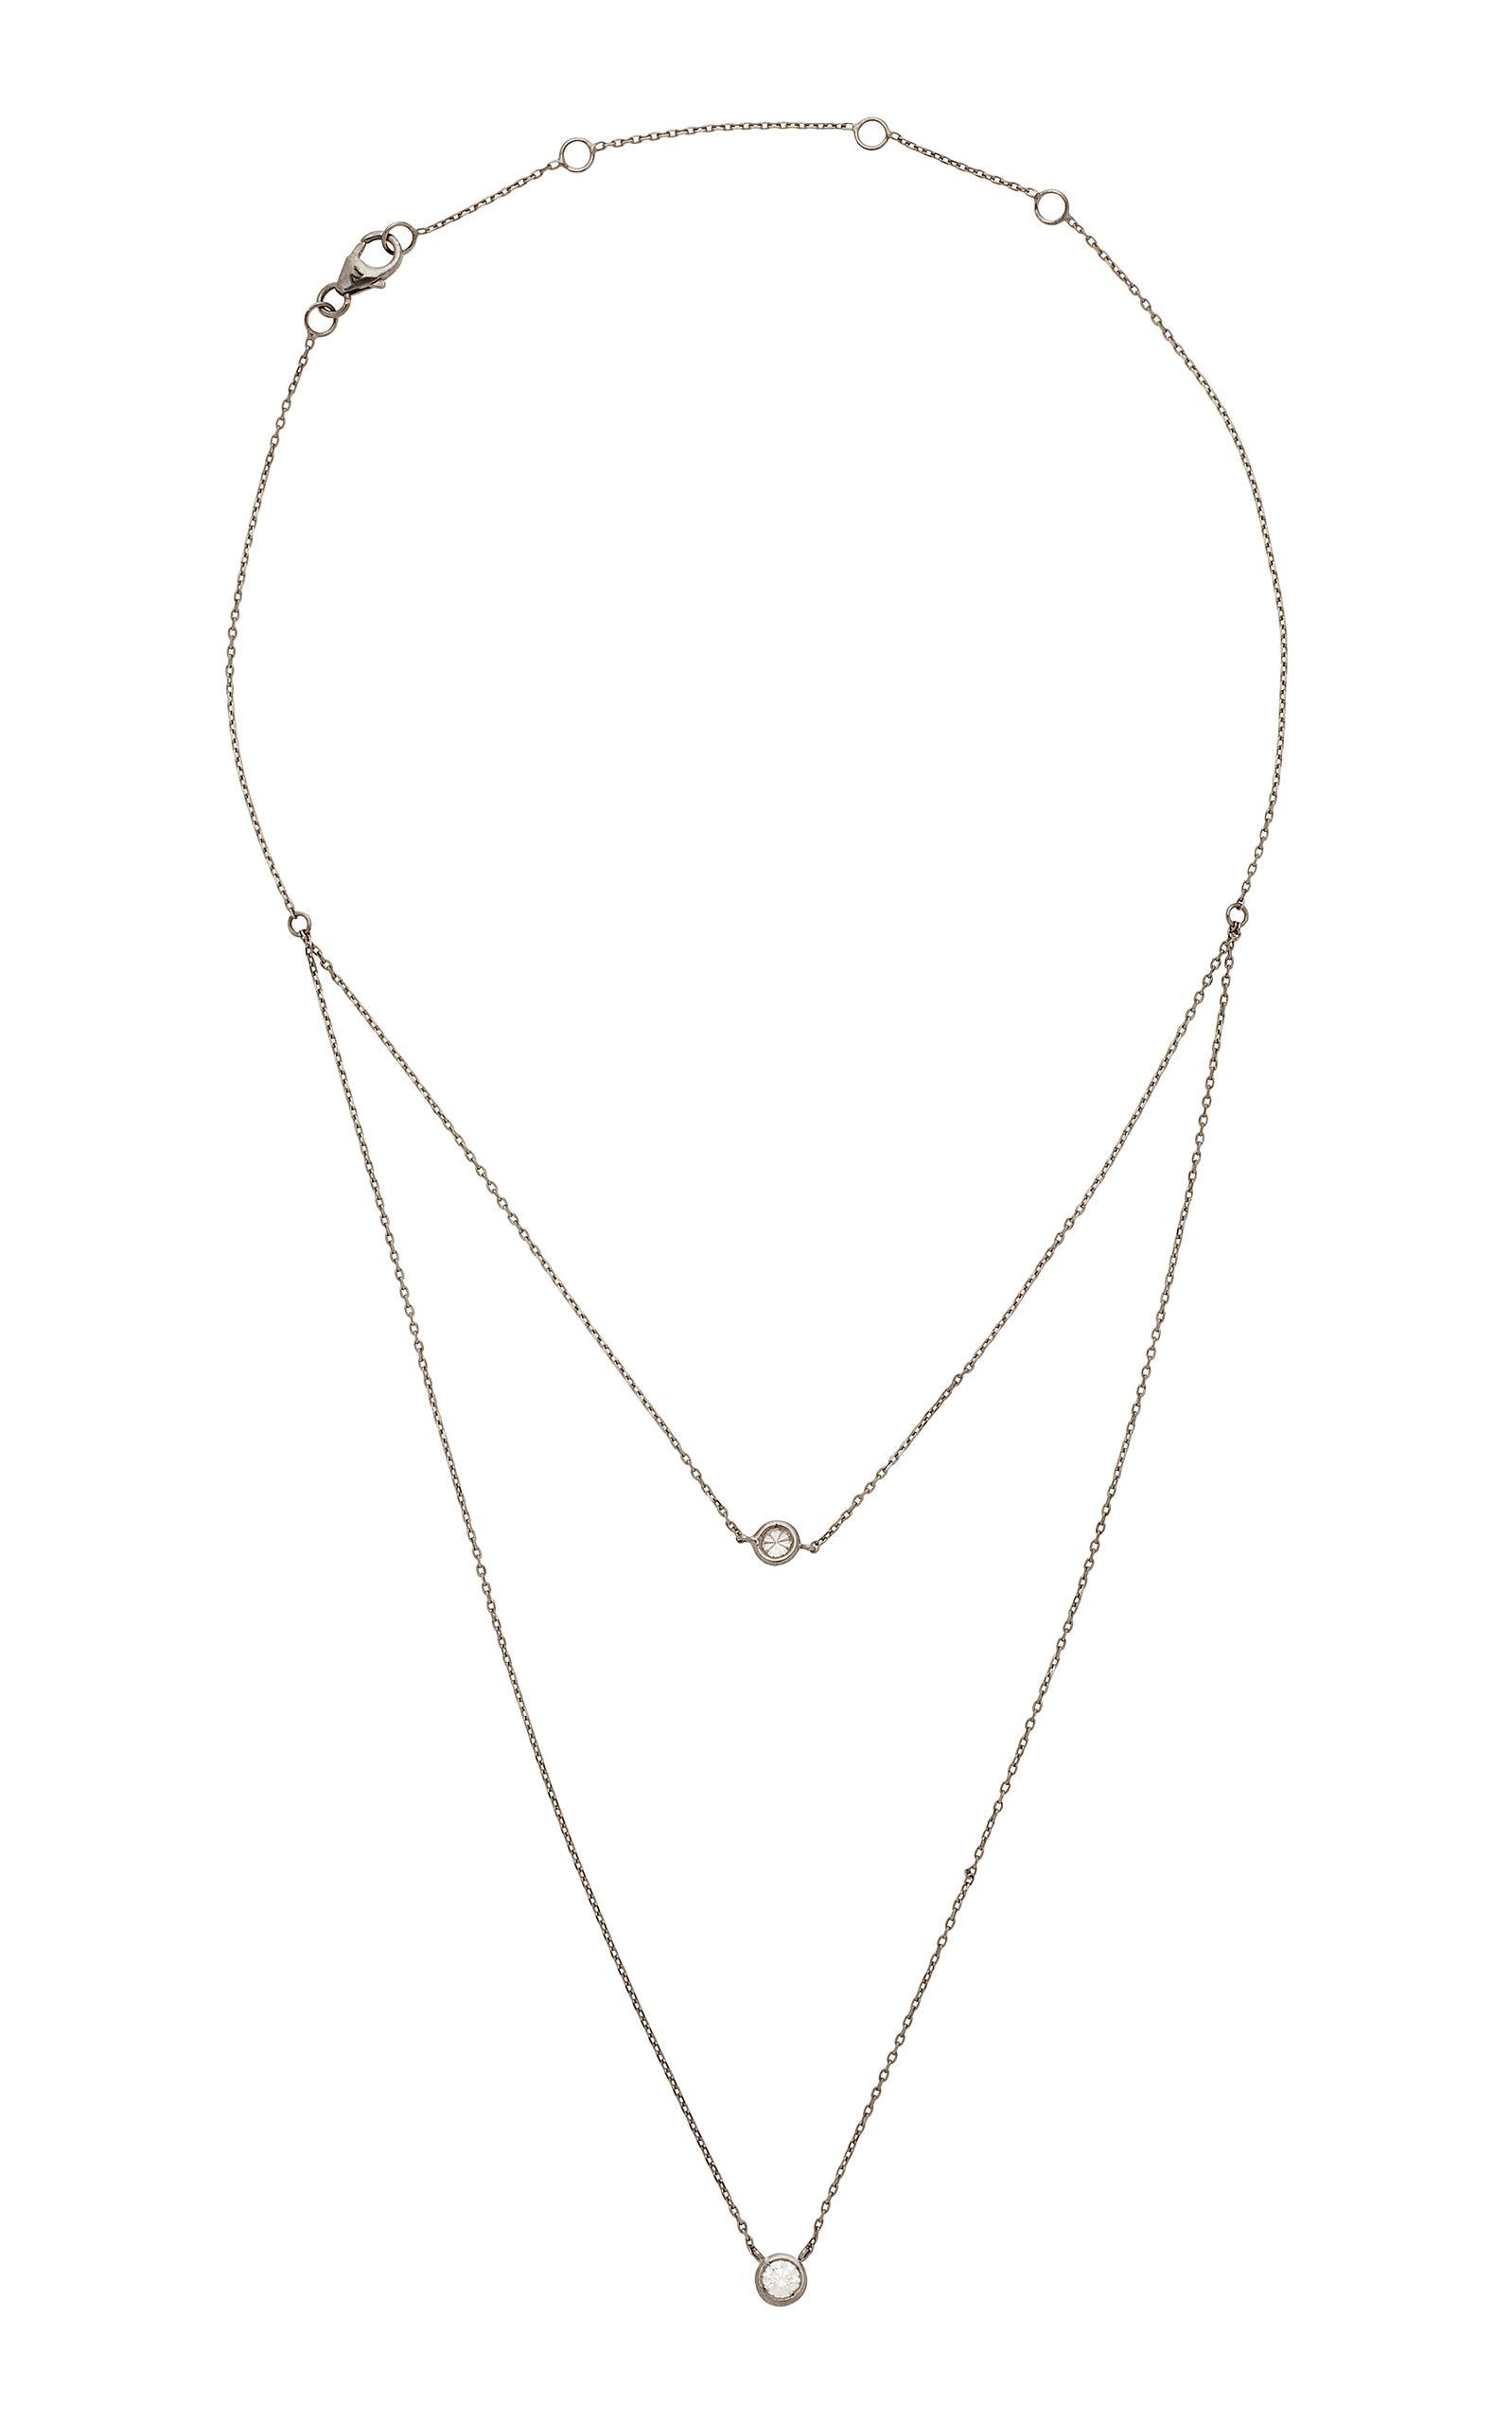 Jack vartanian k white gold and black rhodium lightbrown diamond